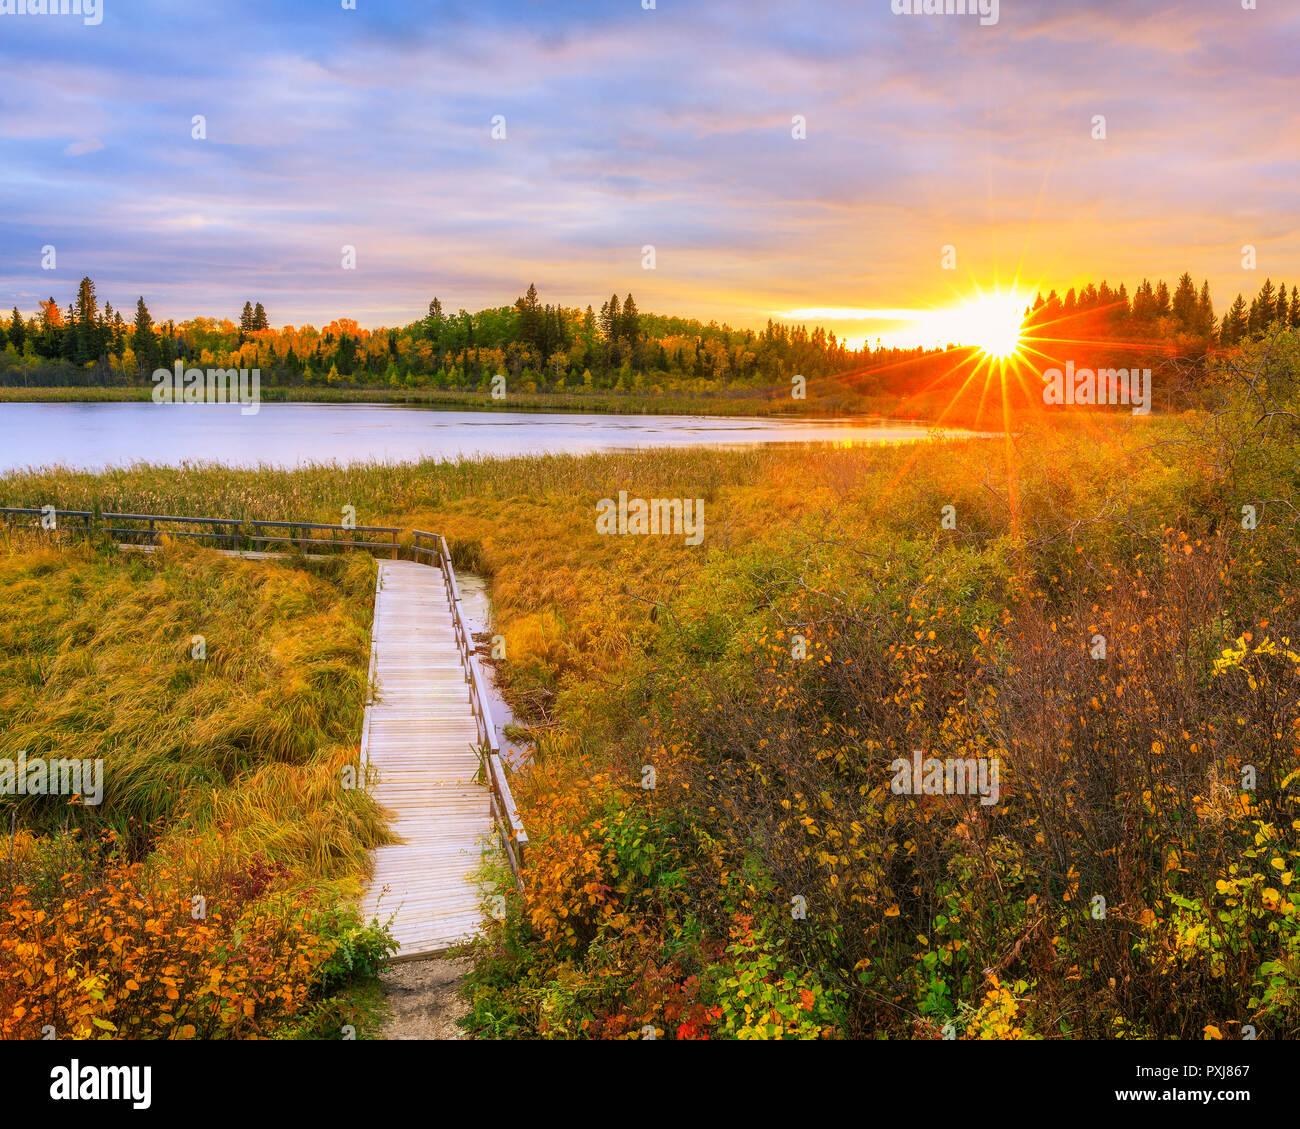 Autumn sunset over Ominik Marsh Boardwalk Trail, Riding Mountain National Park, Manitoba, Canada. Stock Photo